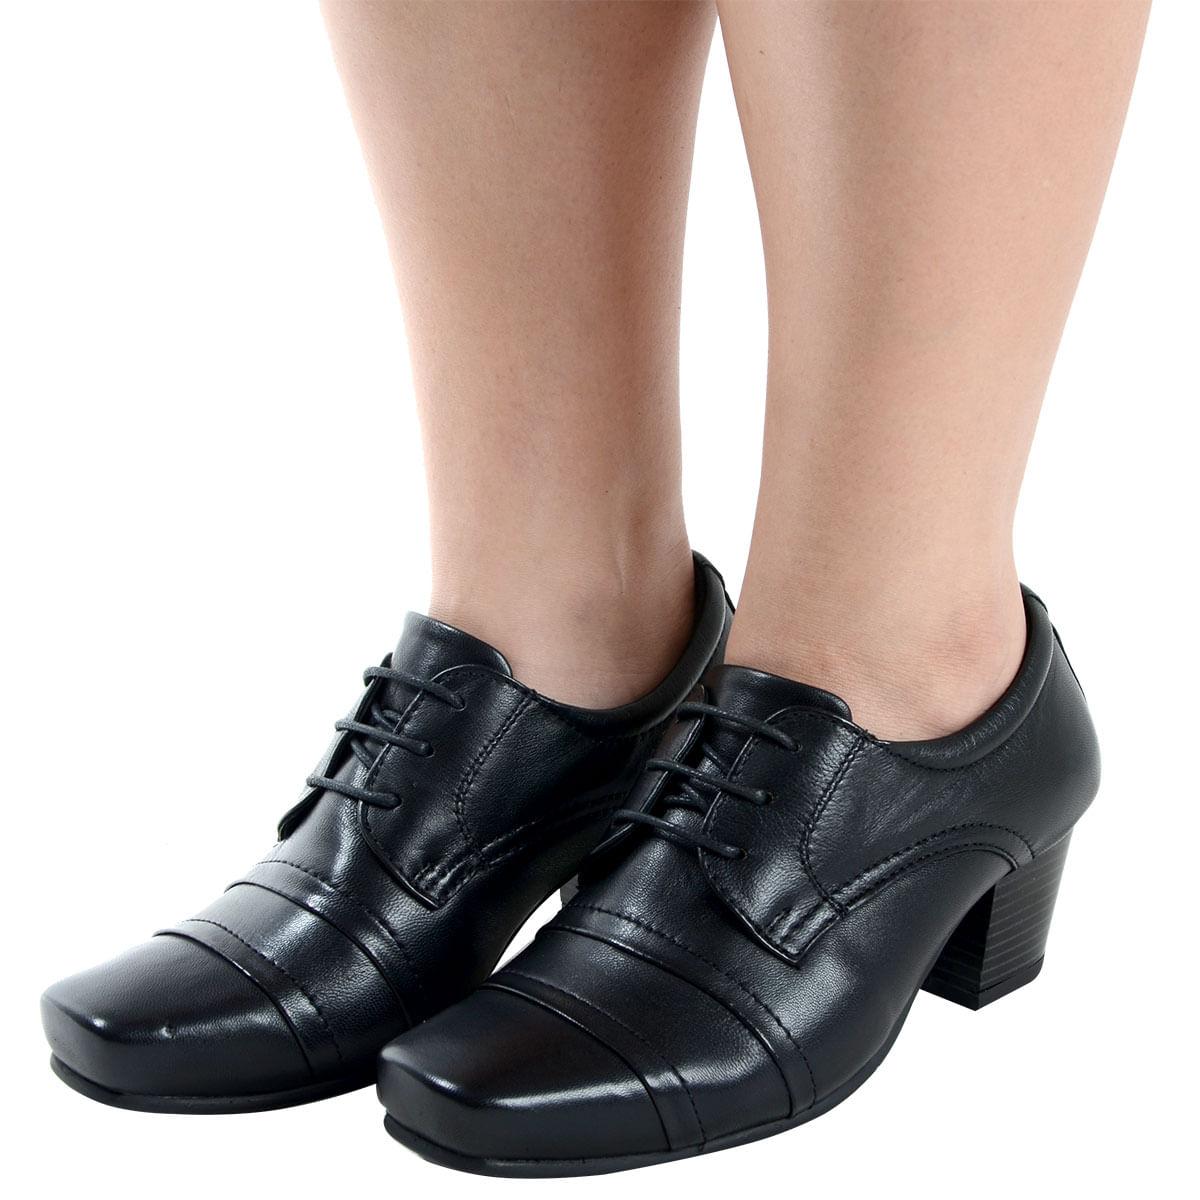 38c3042540 Sapato Salto Medio Confort Preto - Laura Prado